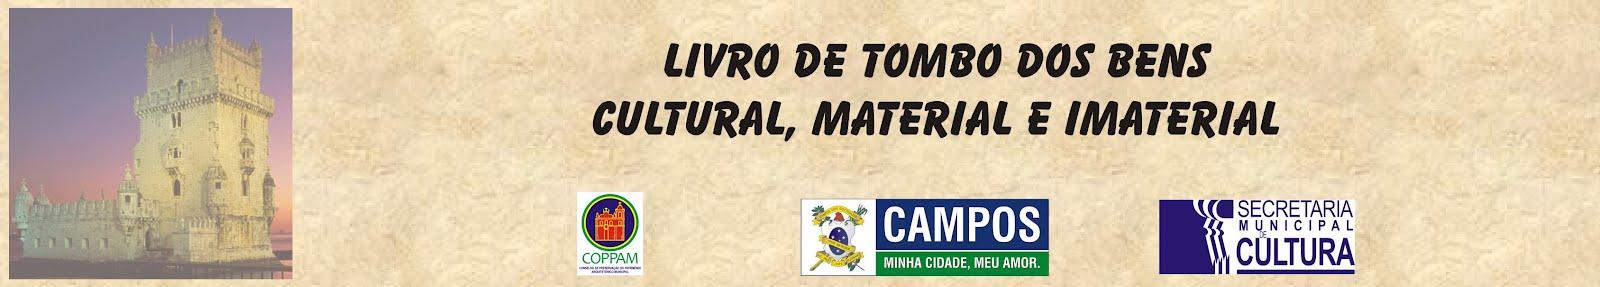 Livro de Tombo - Cultural e Imaterial